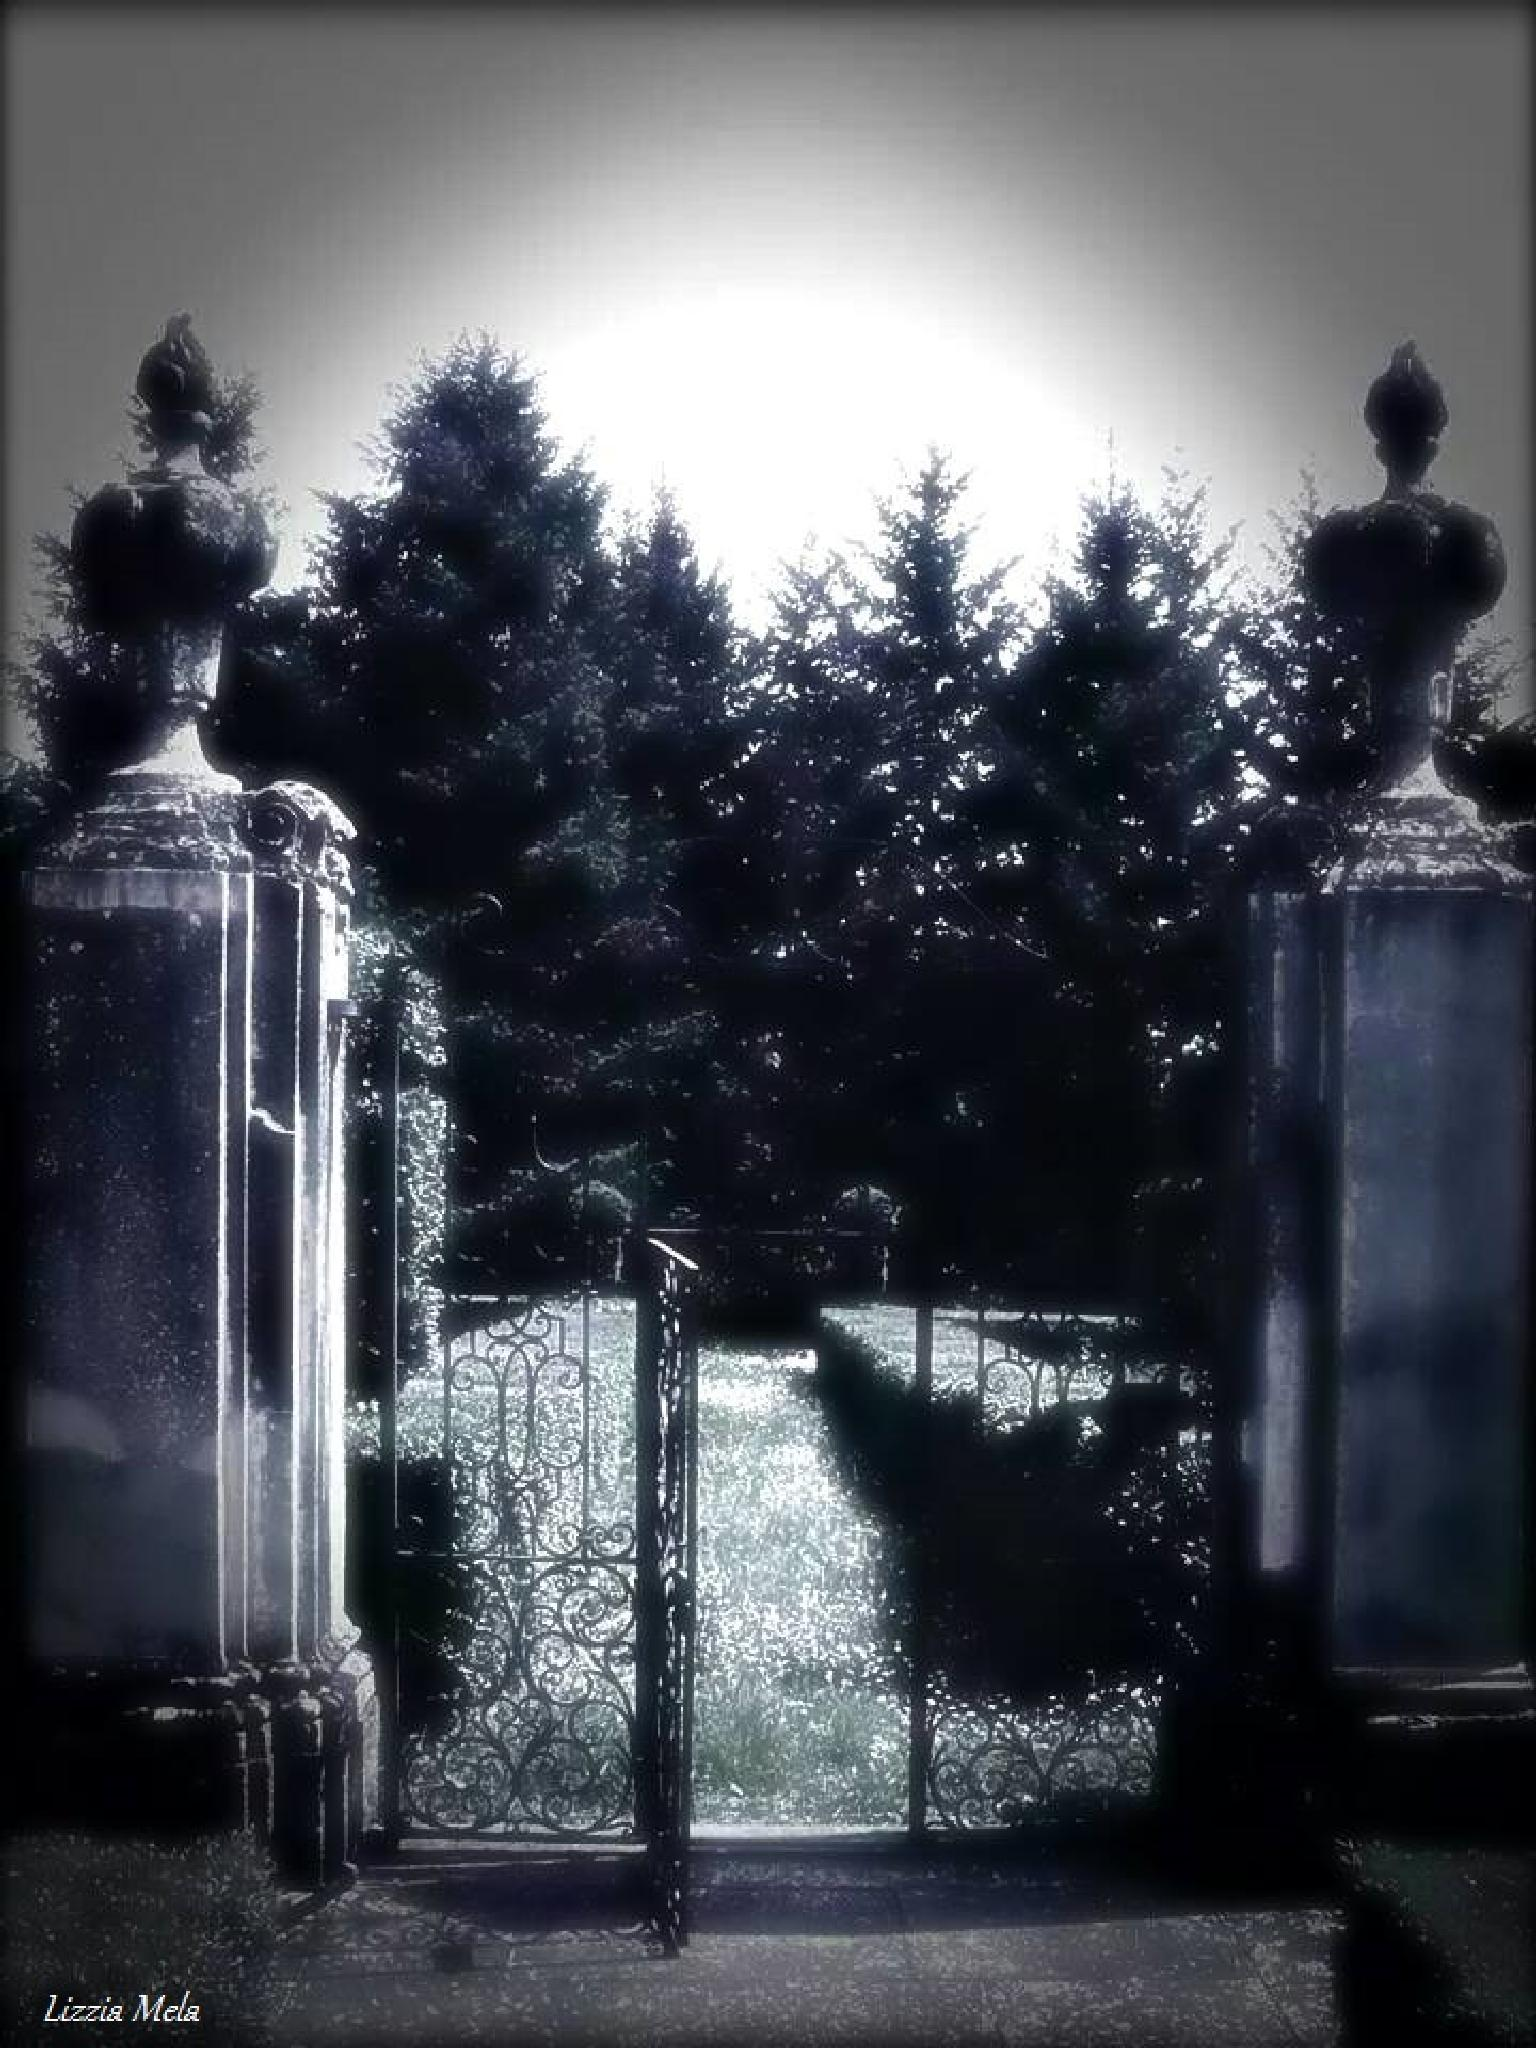 Private cemetery (Rivalta - Piacenza, Italy) by lizzia.mela